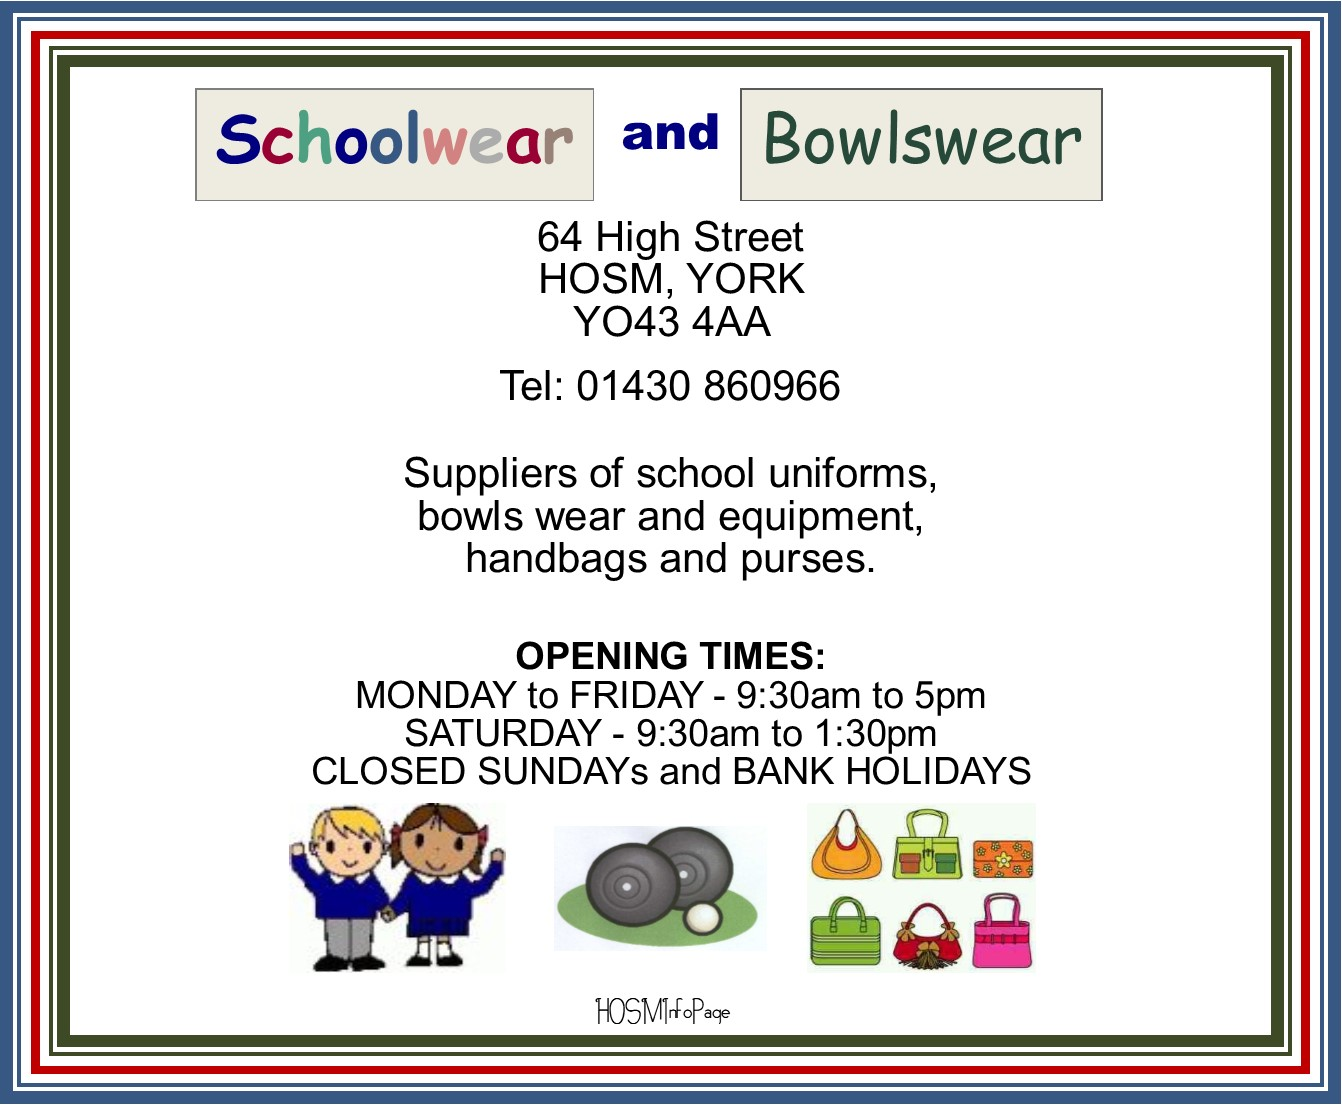 Bowlswear & Equipment